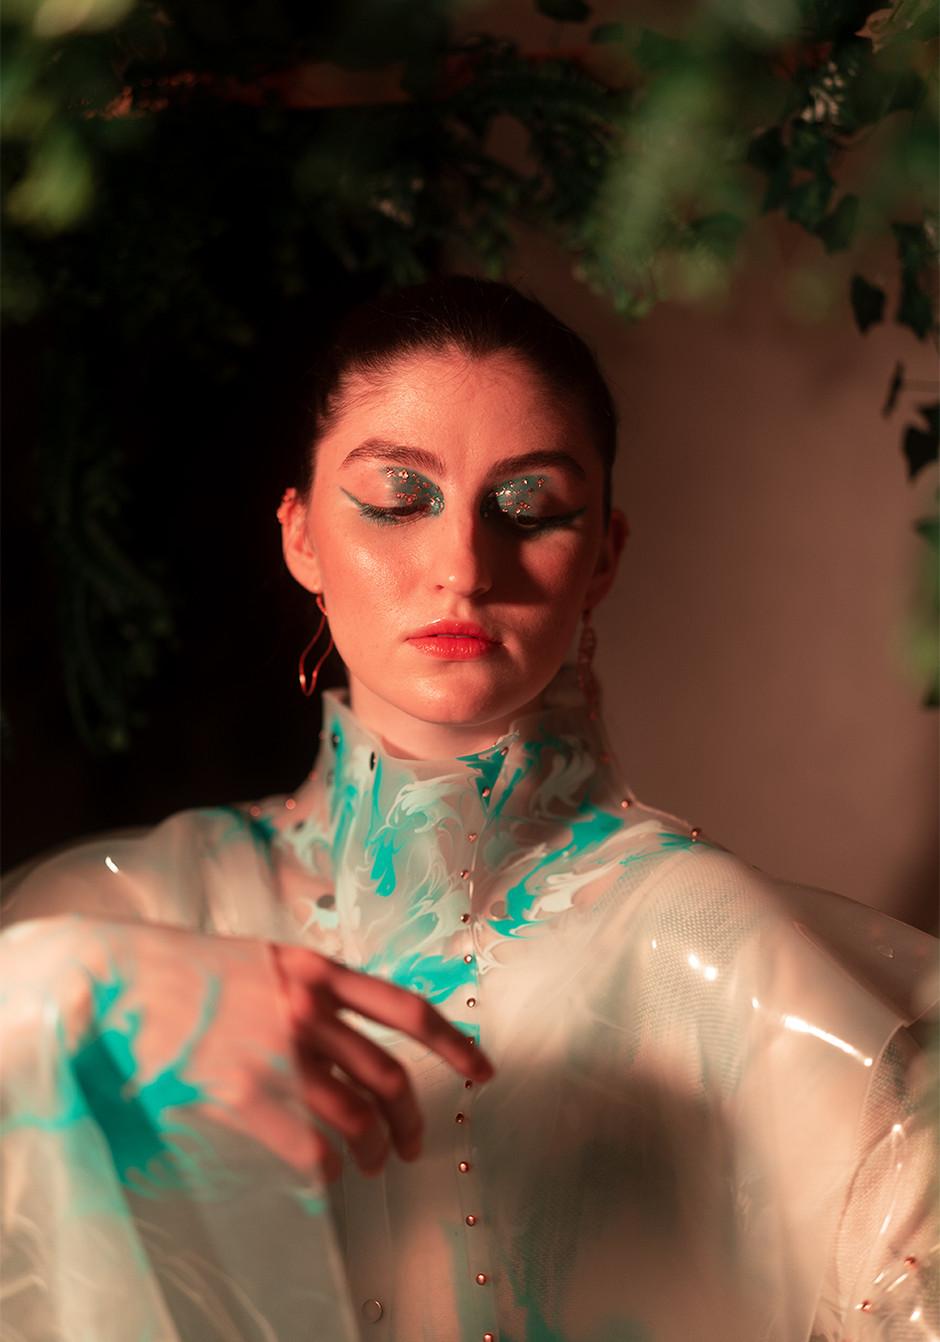 Makeup and Hair: Kat Battershill Designer : Flavius Alexandru Sincaru Photographer: Baturalp Goral Model : Oliwia Kubic